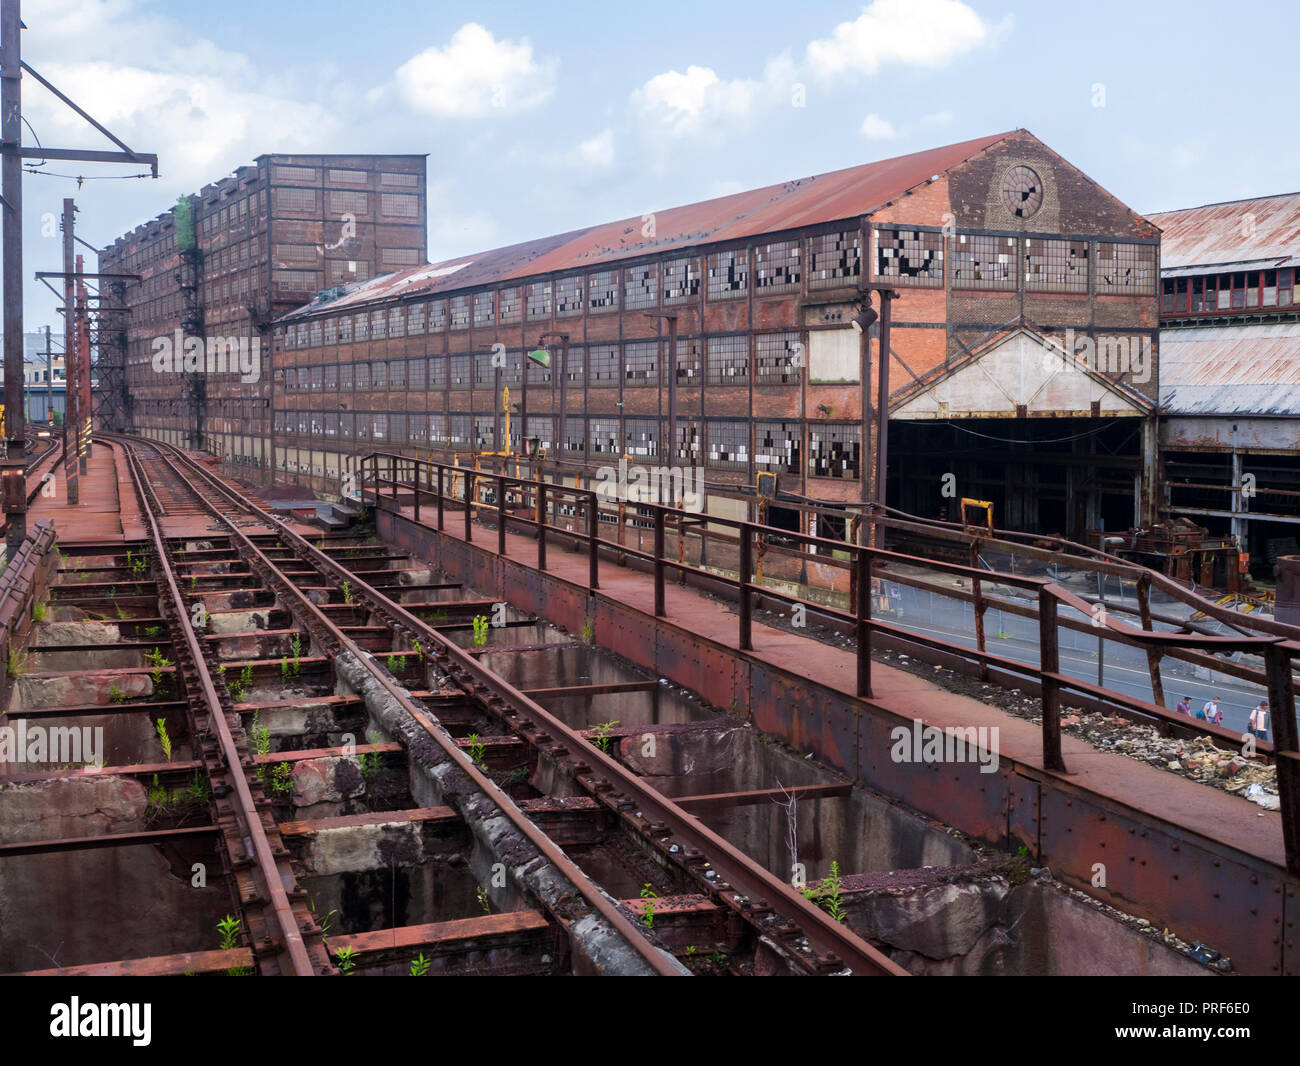 Abandoned rusting remains of Bethlehem Steel Plant in Bethlehem Pennsylvanis, United States - Stock Image